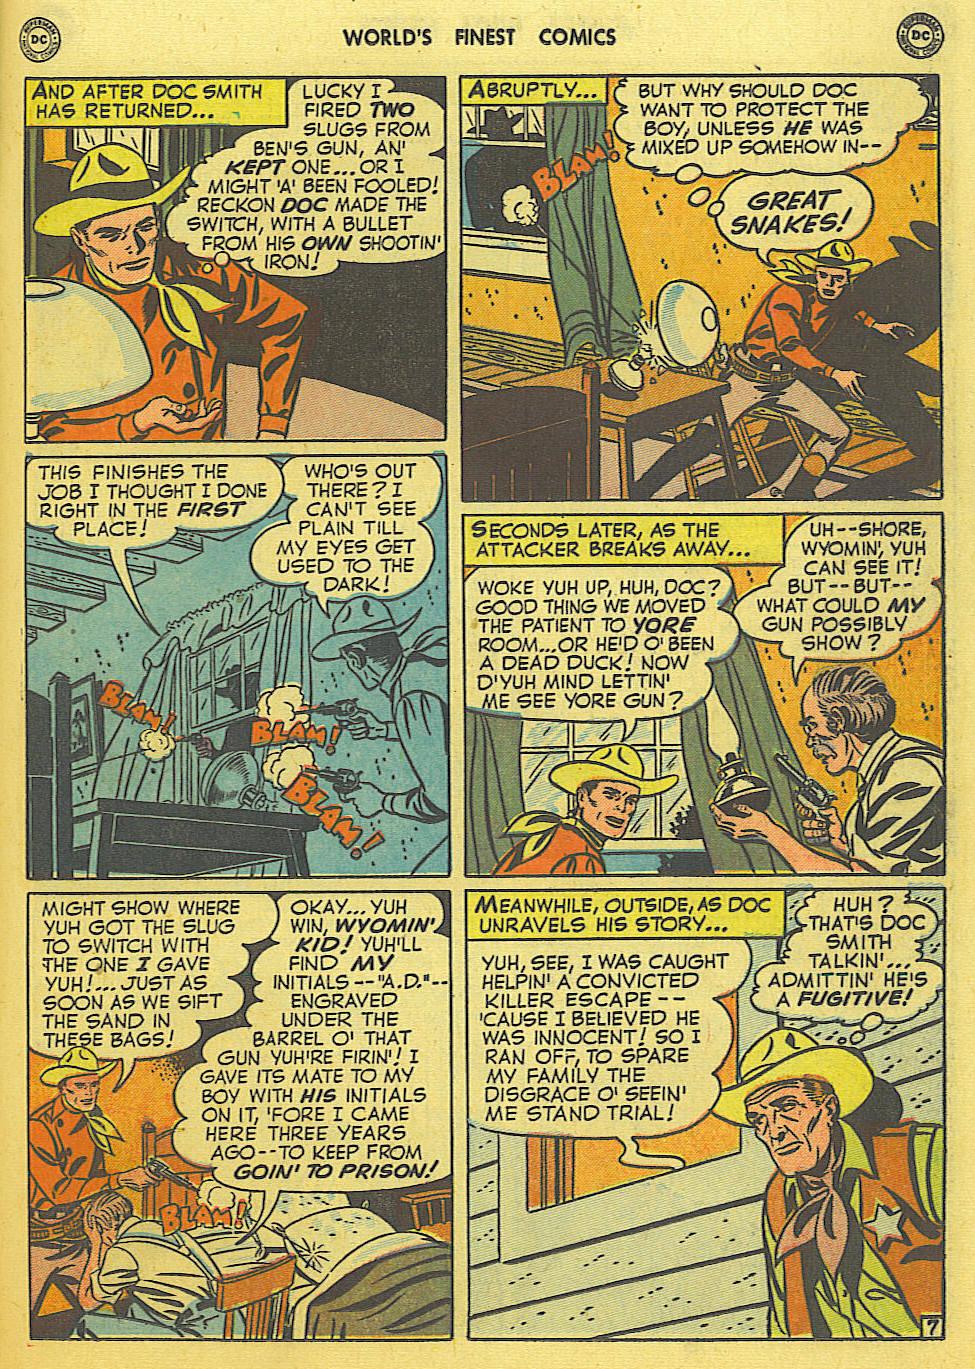 Read online World's Finest Comics comic -  Issue #49 - 46